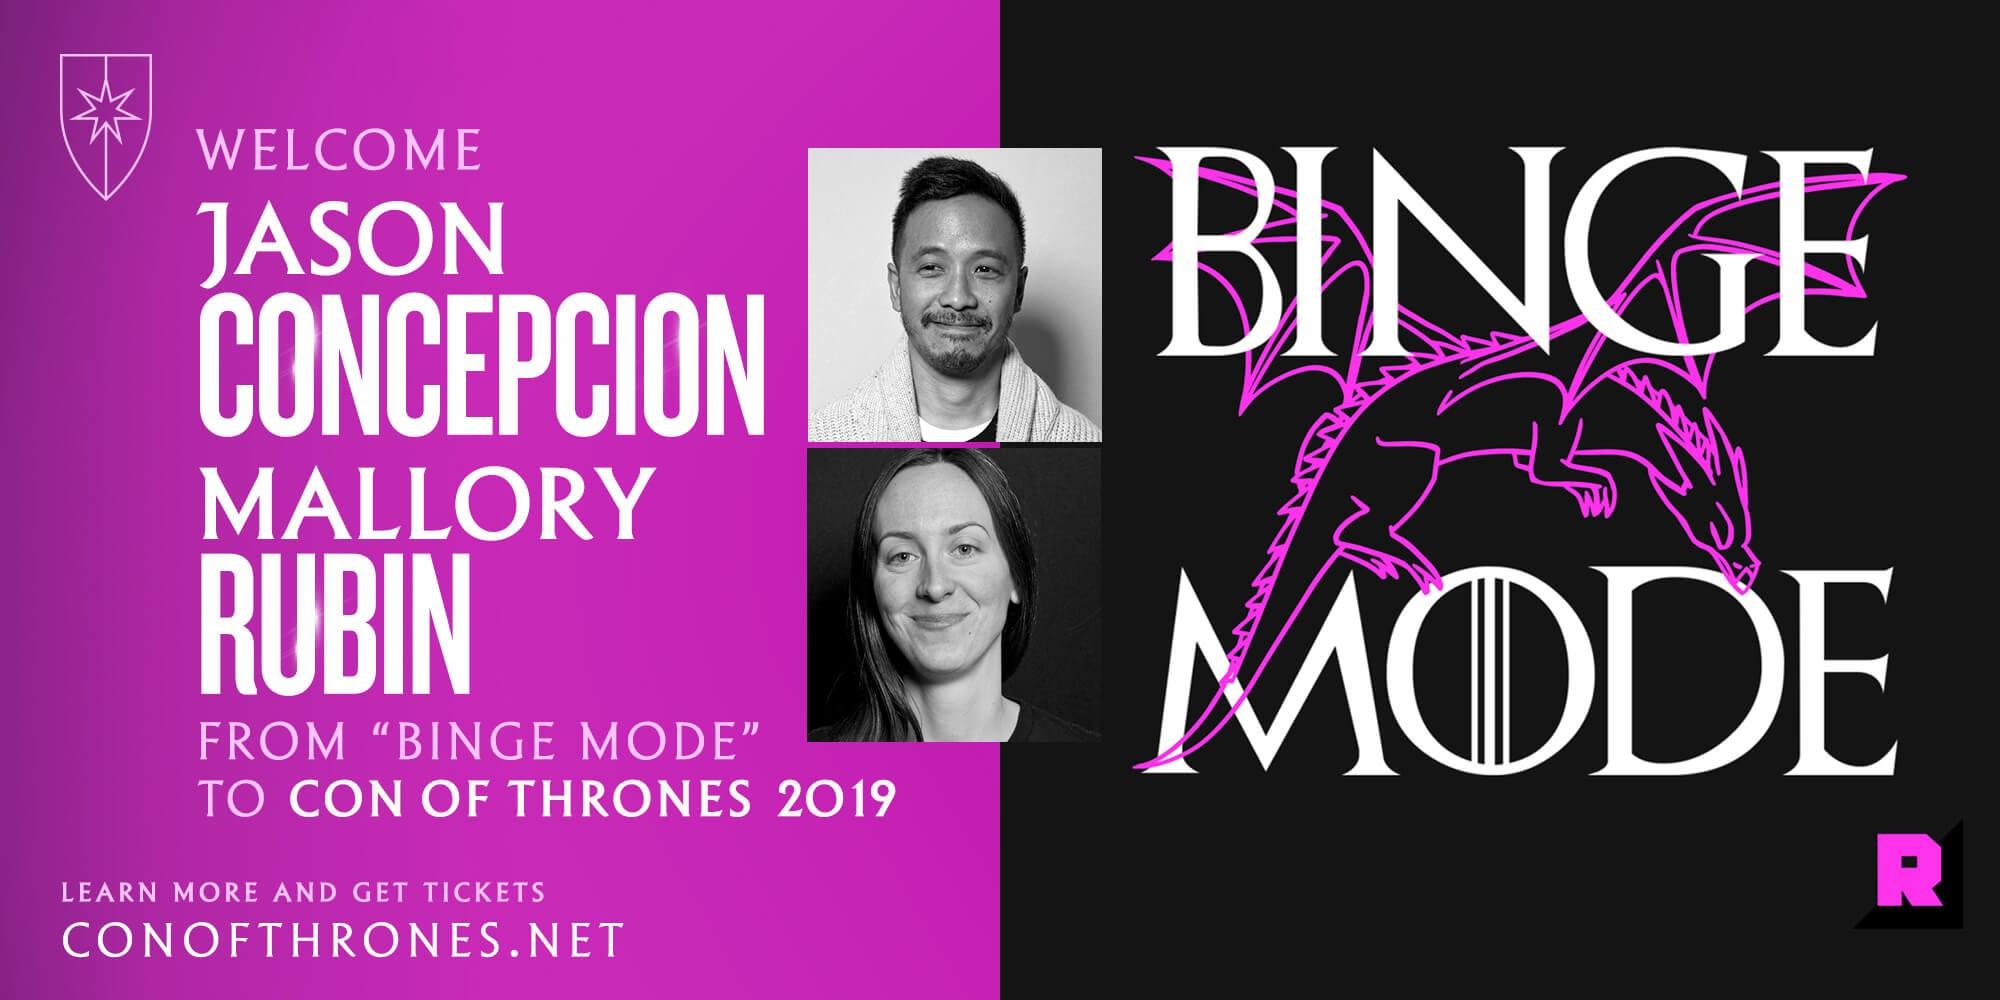 Con of Thrones Binge MOde